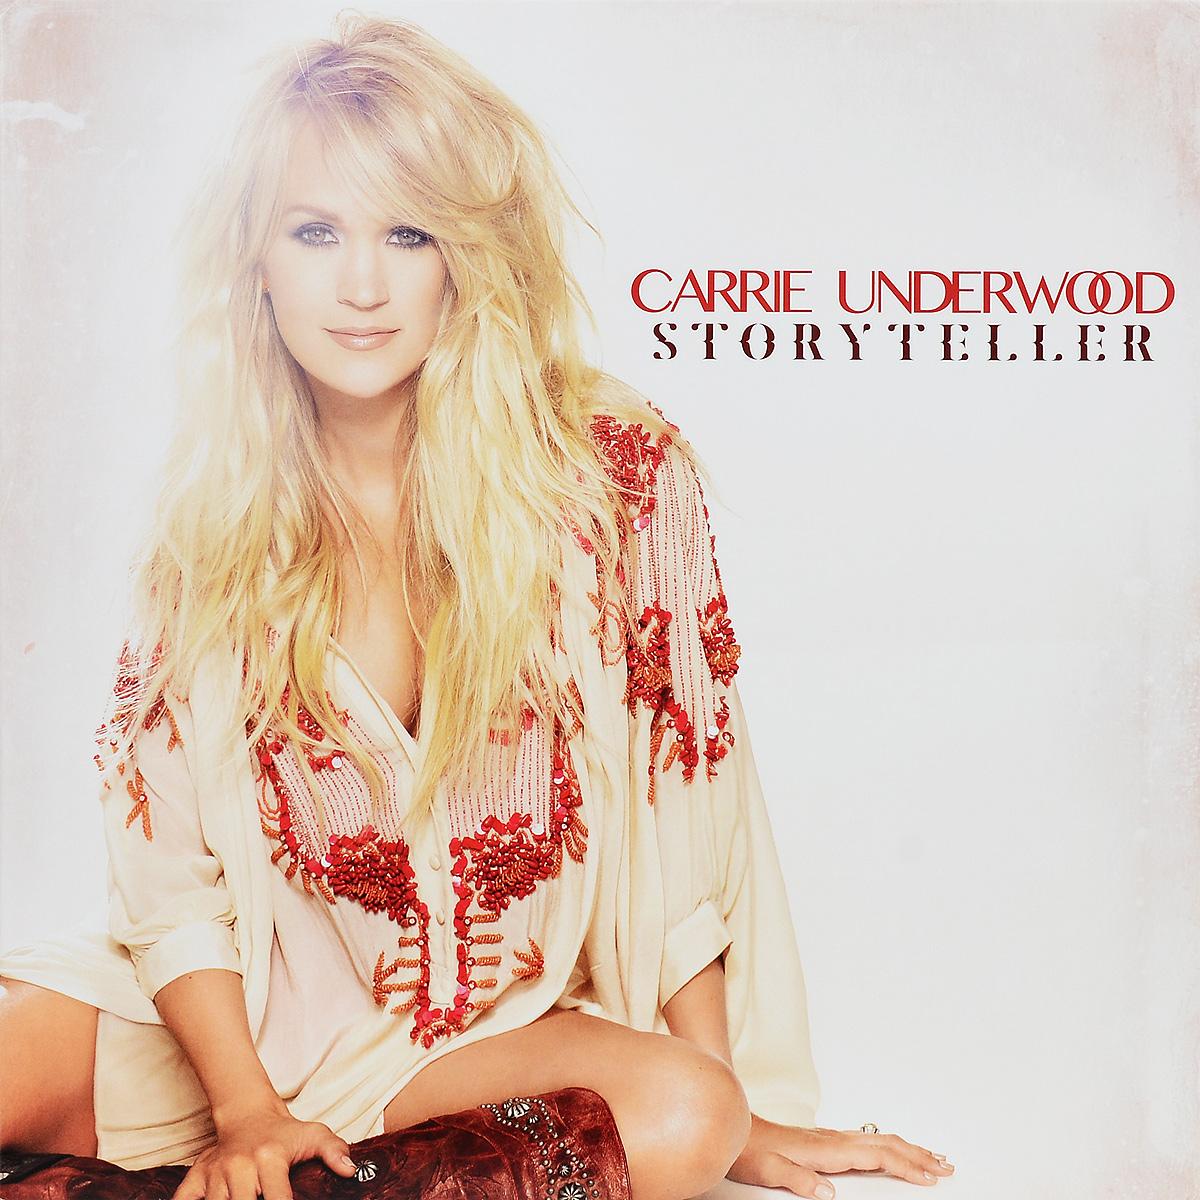 Carrie Underwood. Storyteller (2 LP)